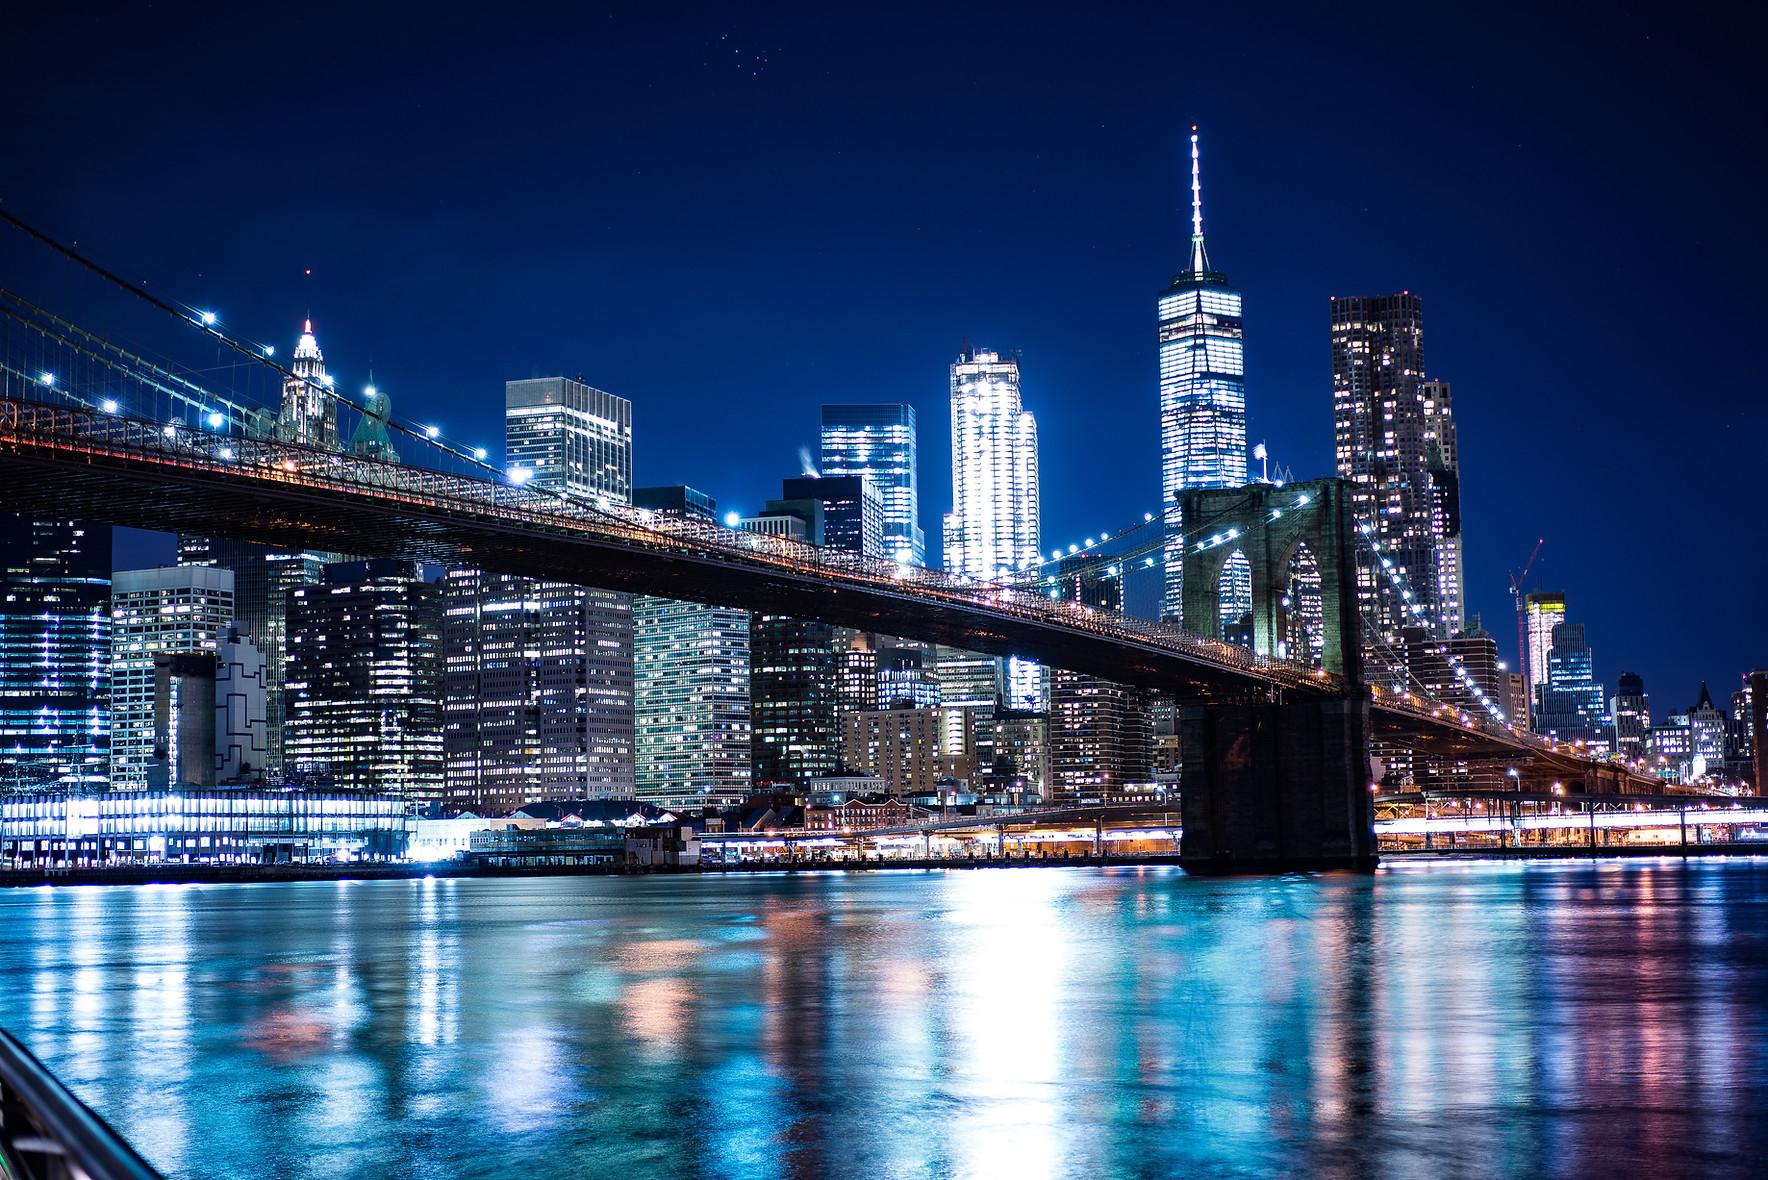 New York Skyline from The Brooklyn Heigh